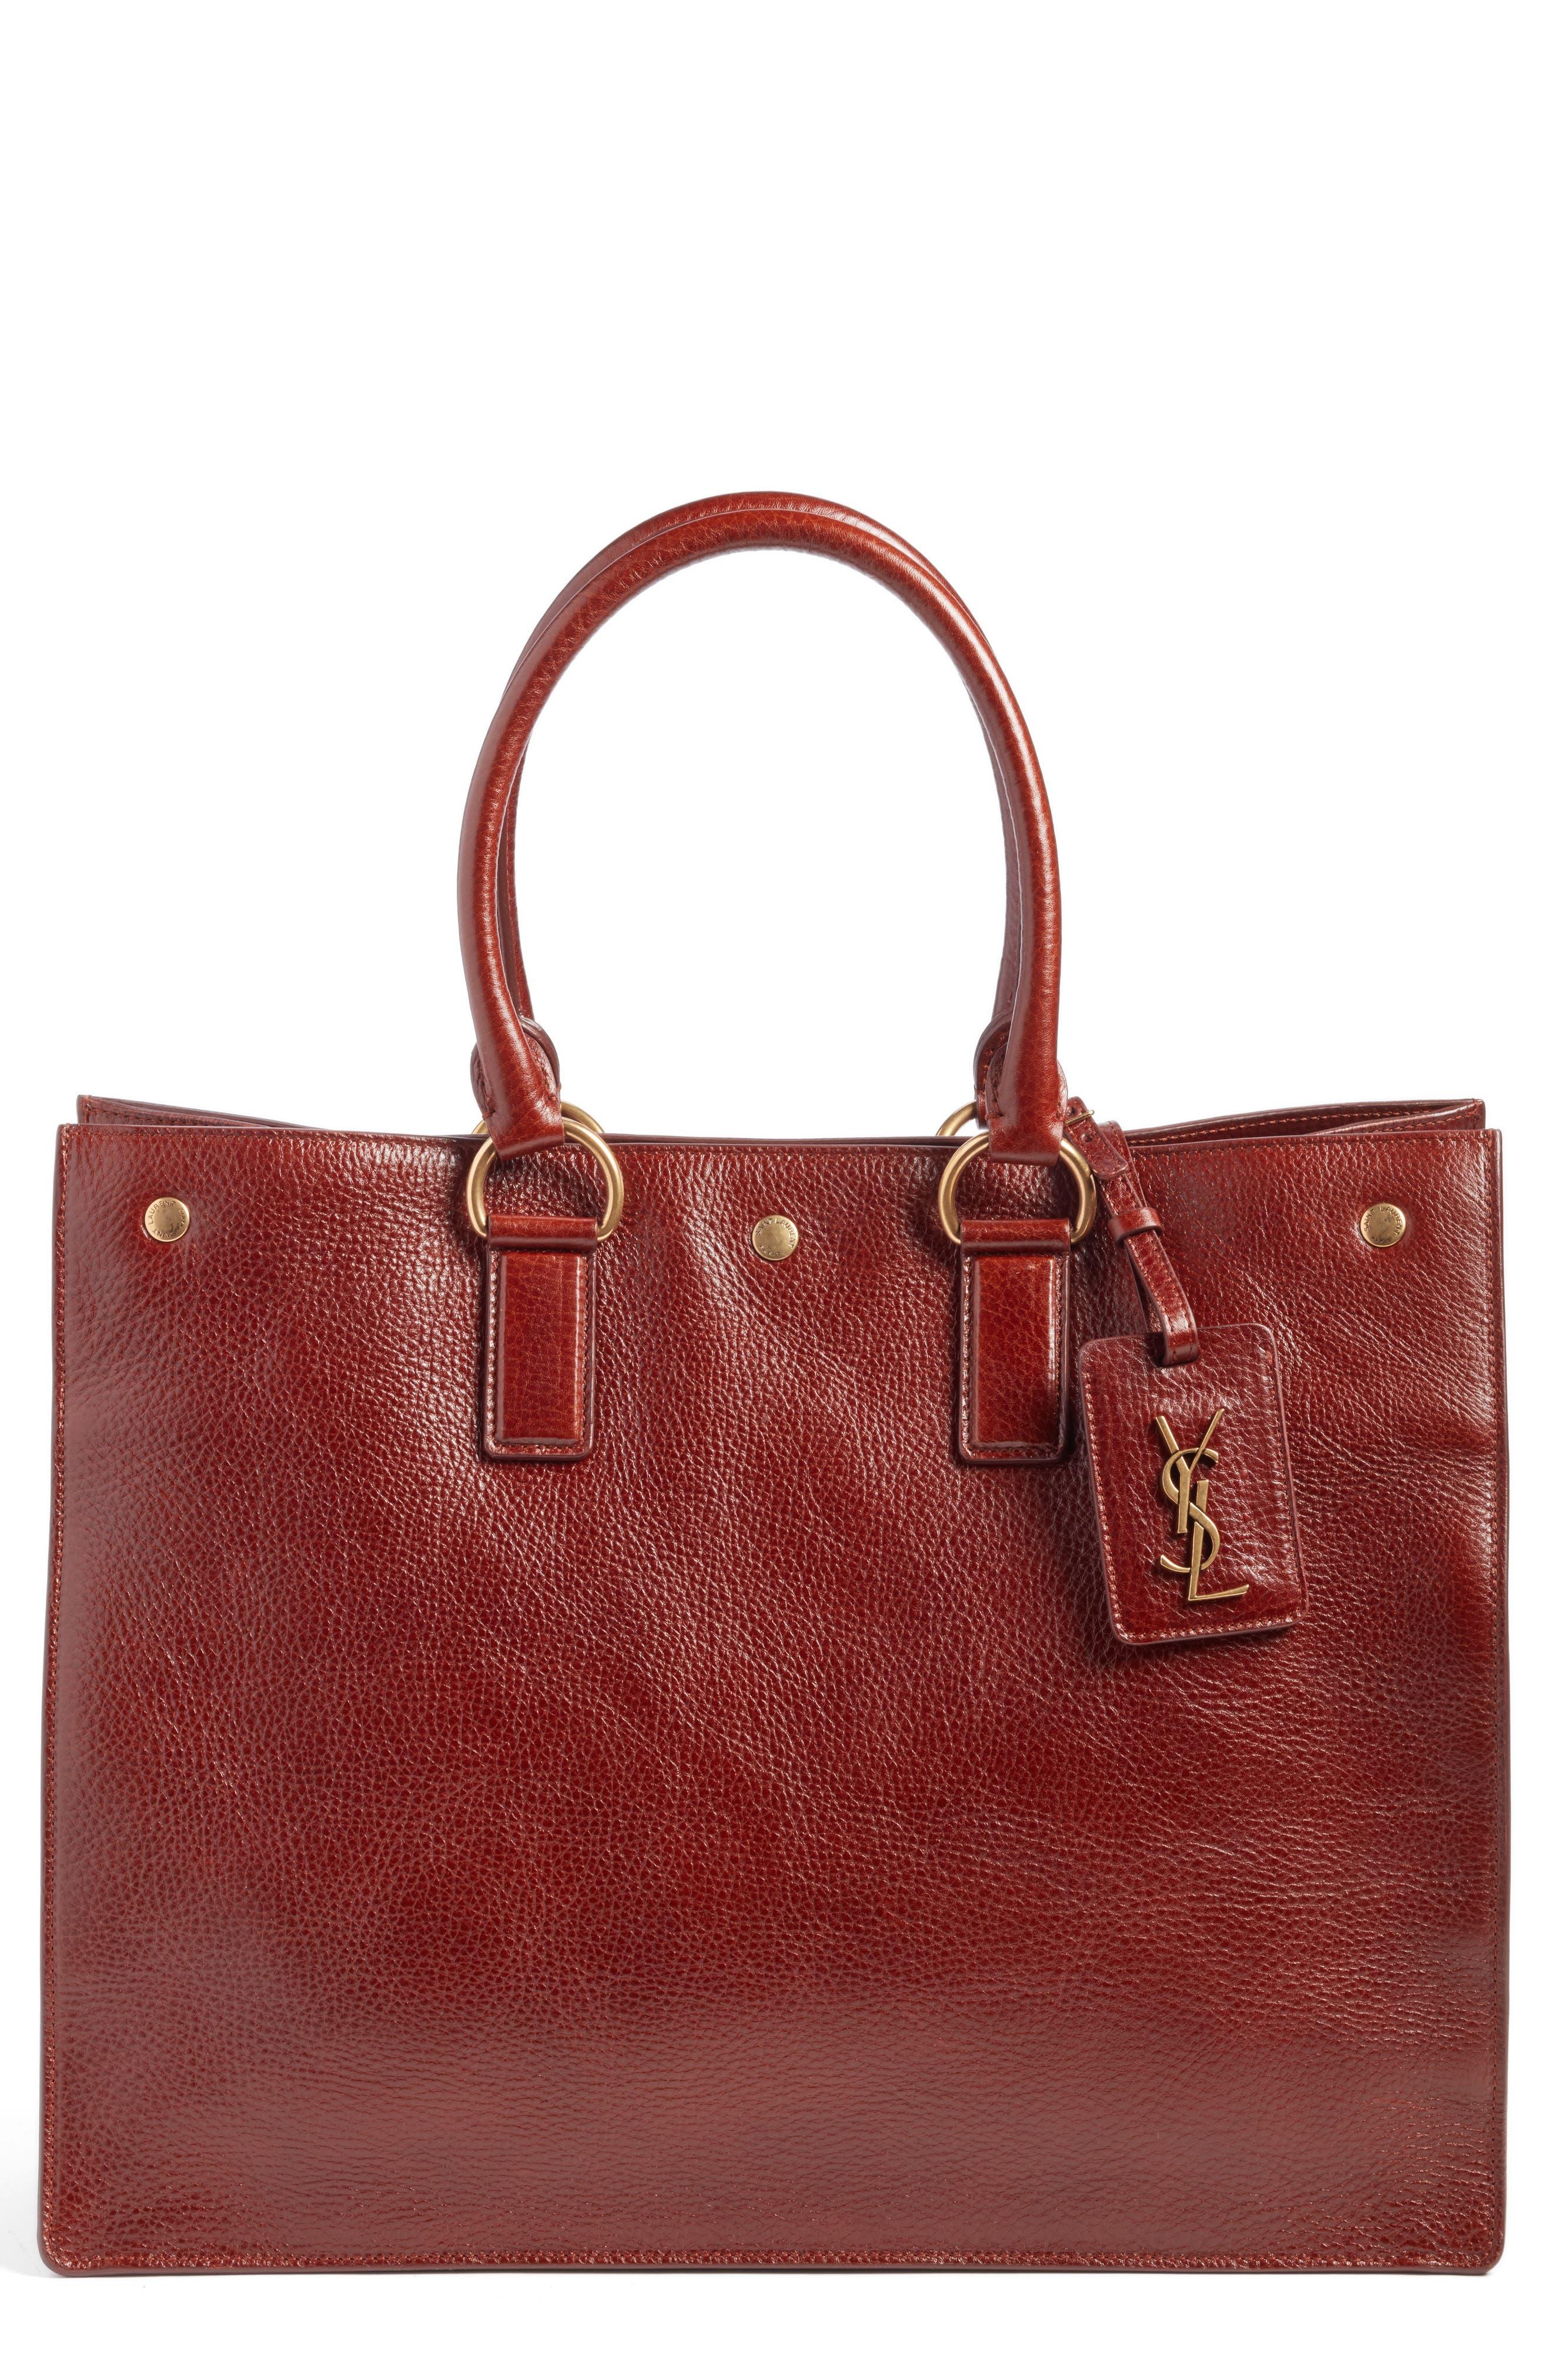 Alternate Image 1 Selected - Saint Laurent Noe Glacé Moroder Leather Tote